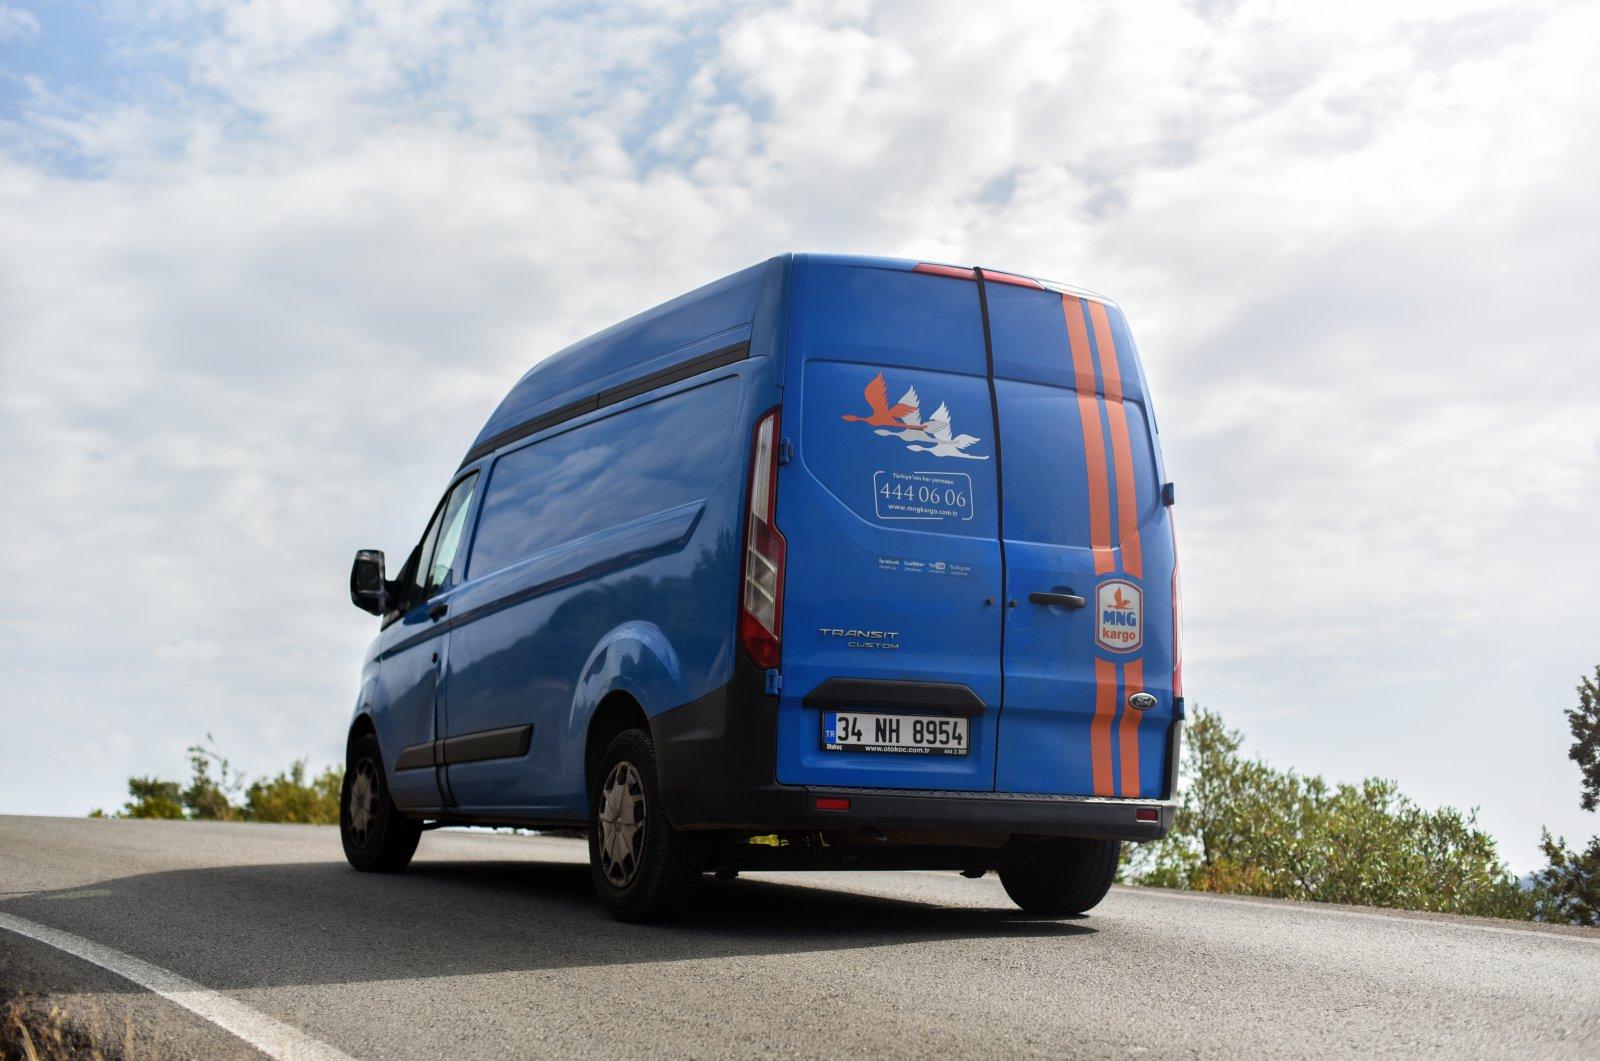 An MNG Kargo delivery van in Marmaris, Turkey, Nov. 10, 2019. (Shutterstock Photo)